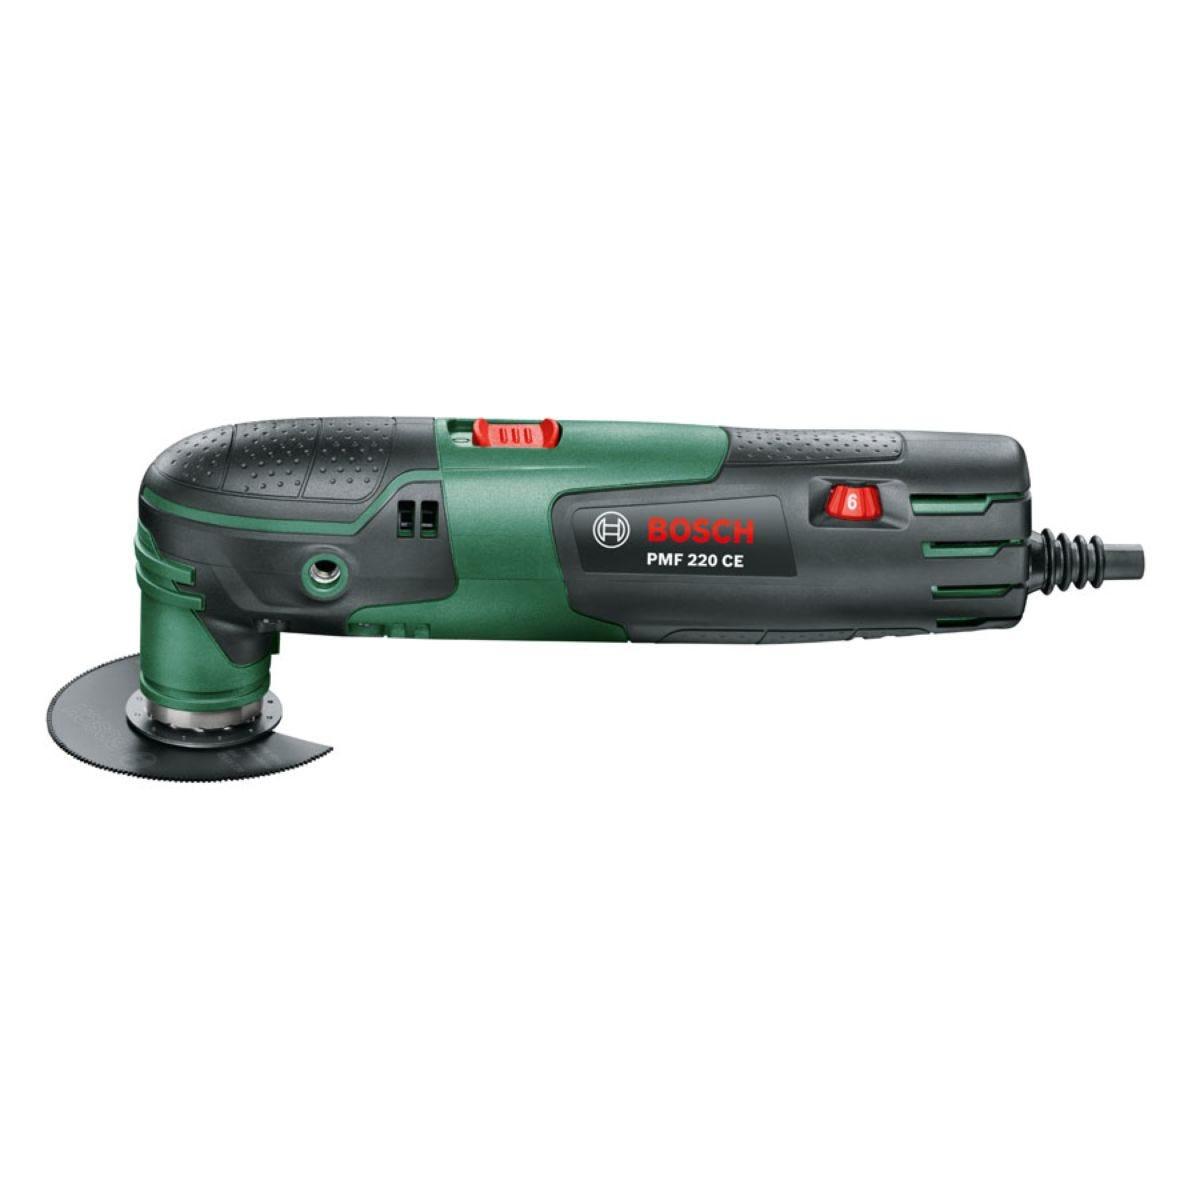 Bosch PMF 220 CE 220W Multi Tool